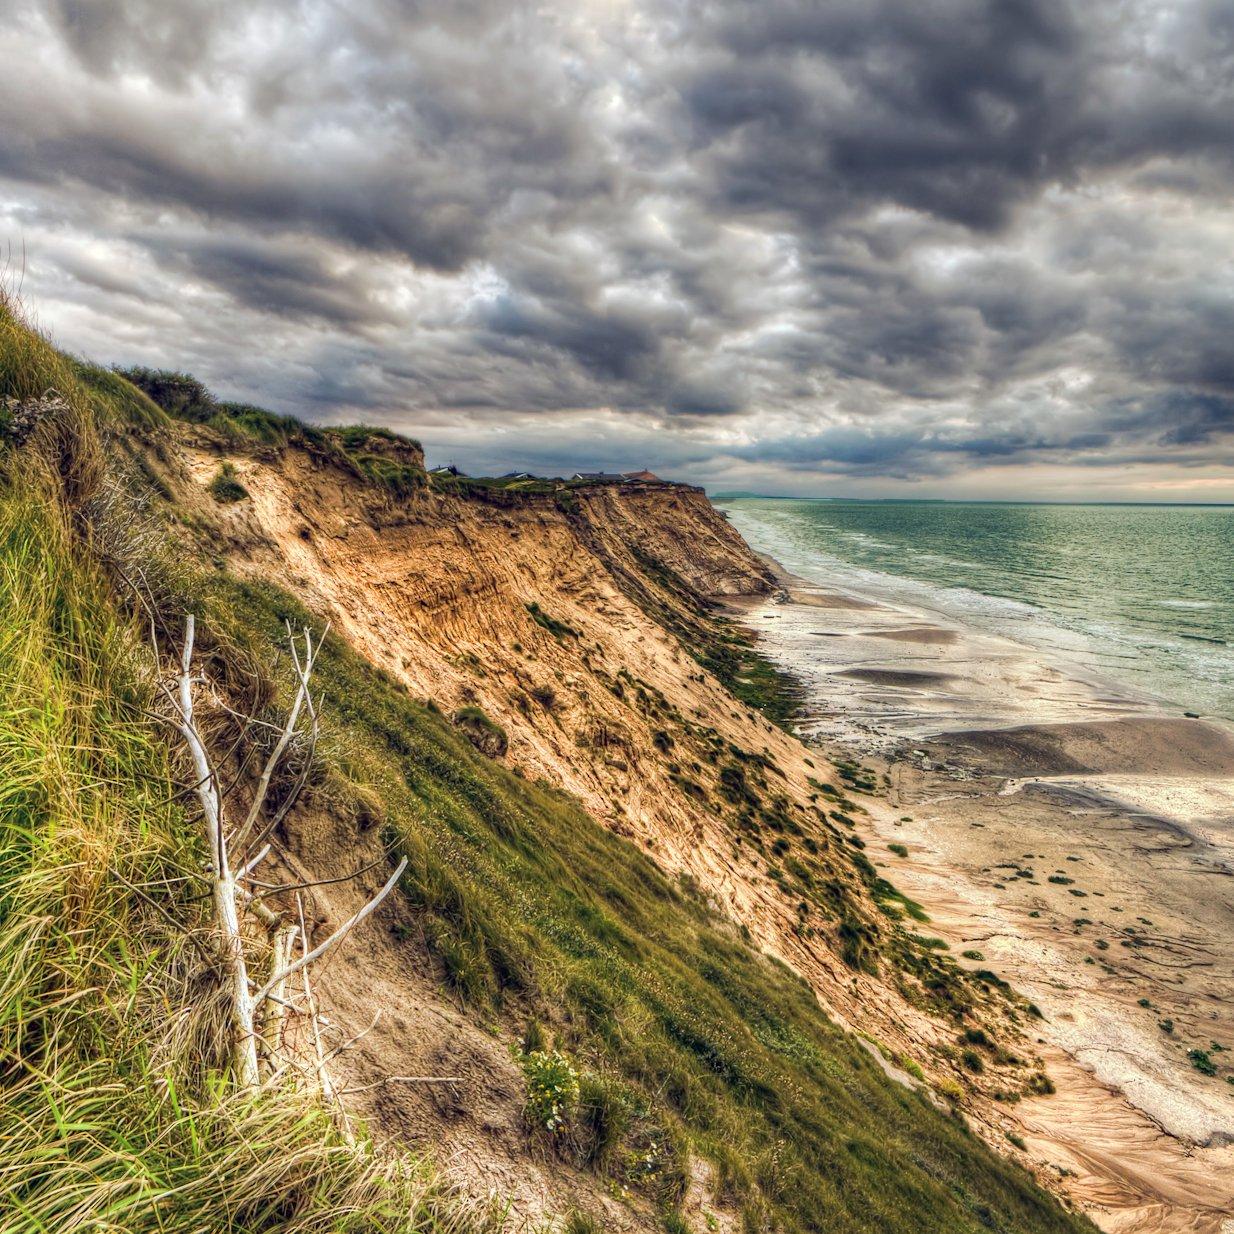 Lønstrup coast01, Denmark